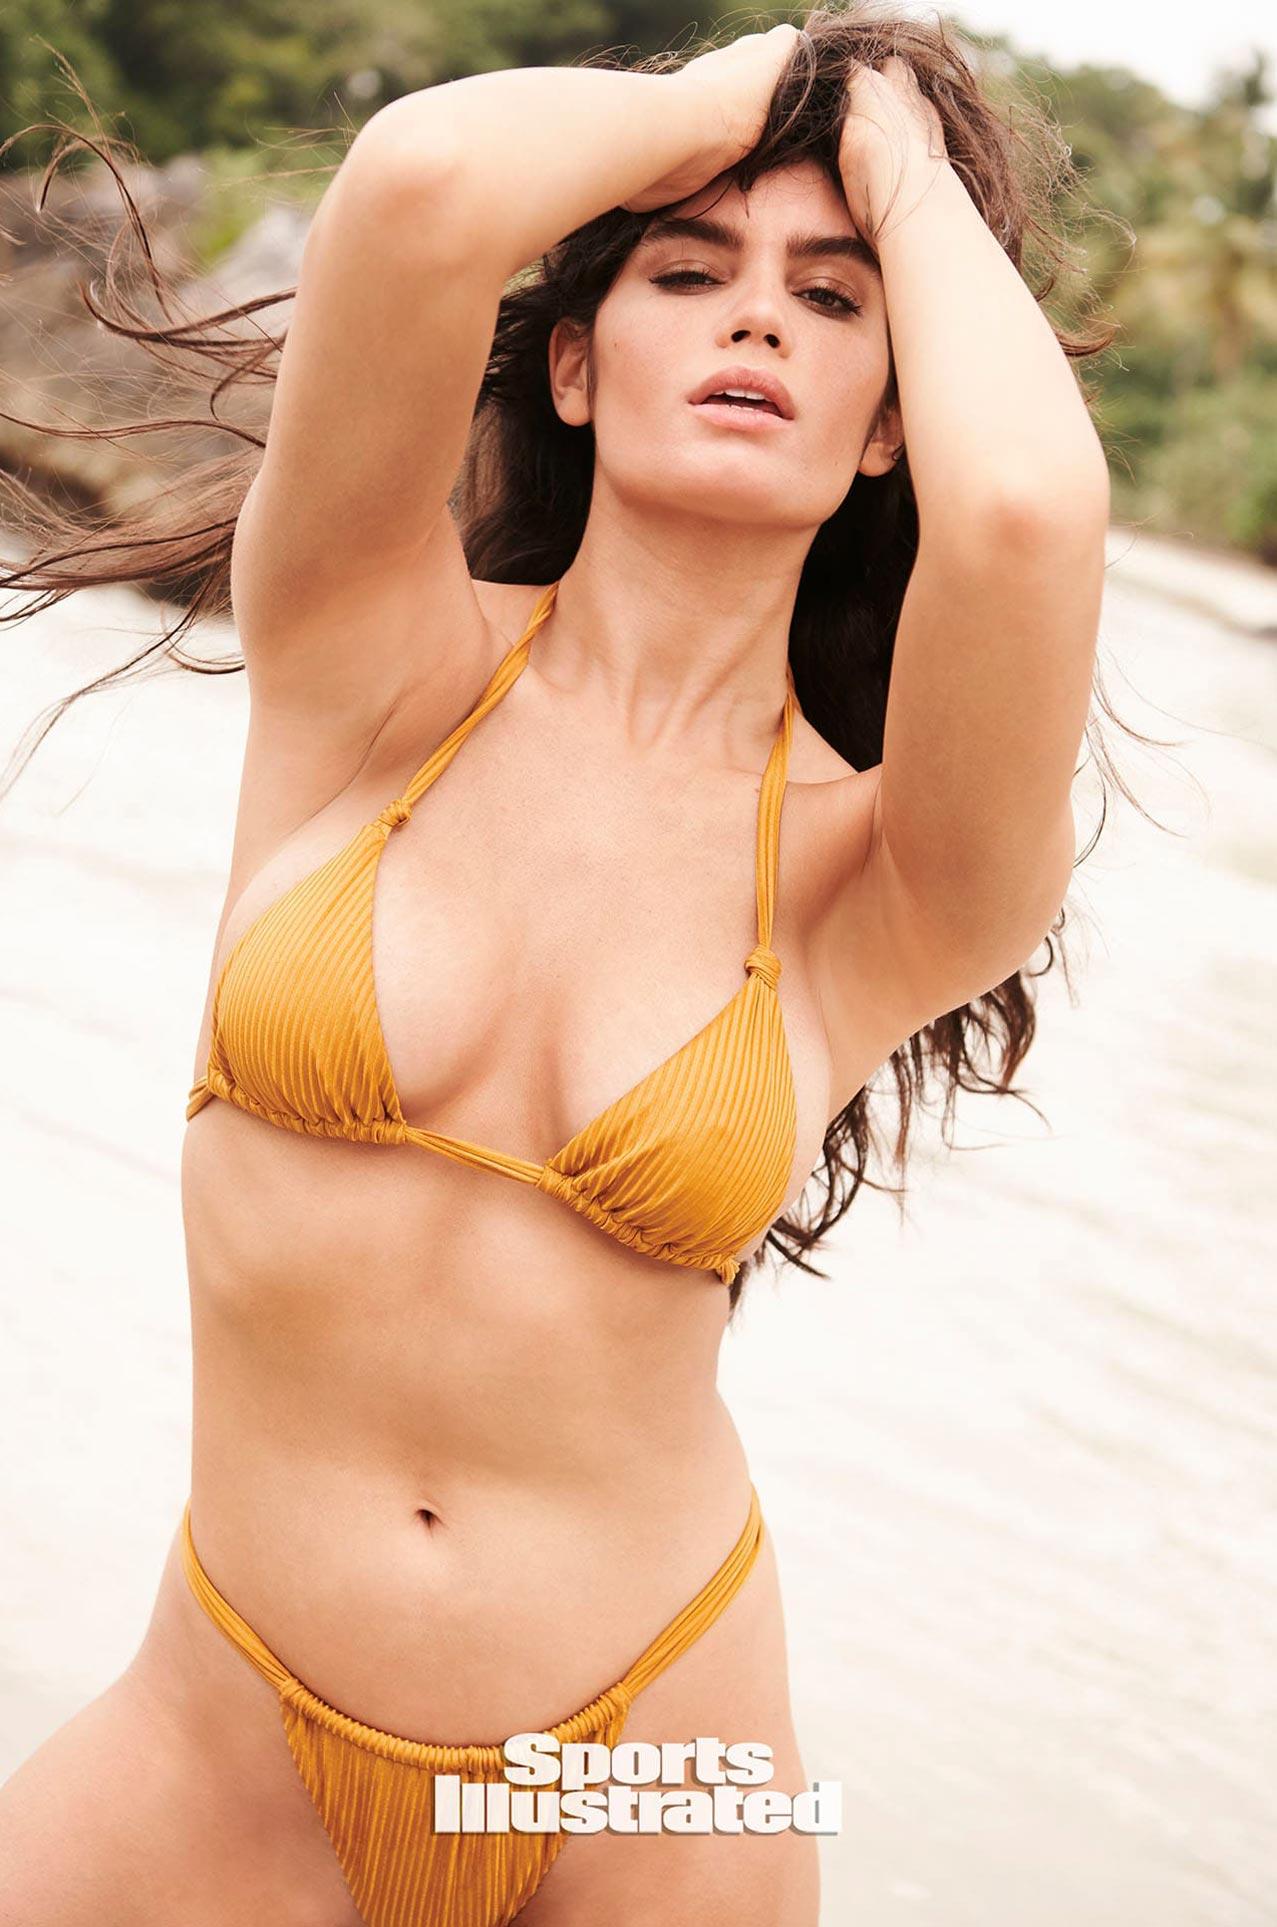 Энн де Паула в каталоге купальников Sports Illustrated Swimsuit 2020 / фото 12